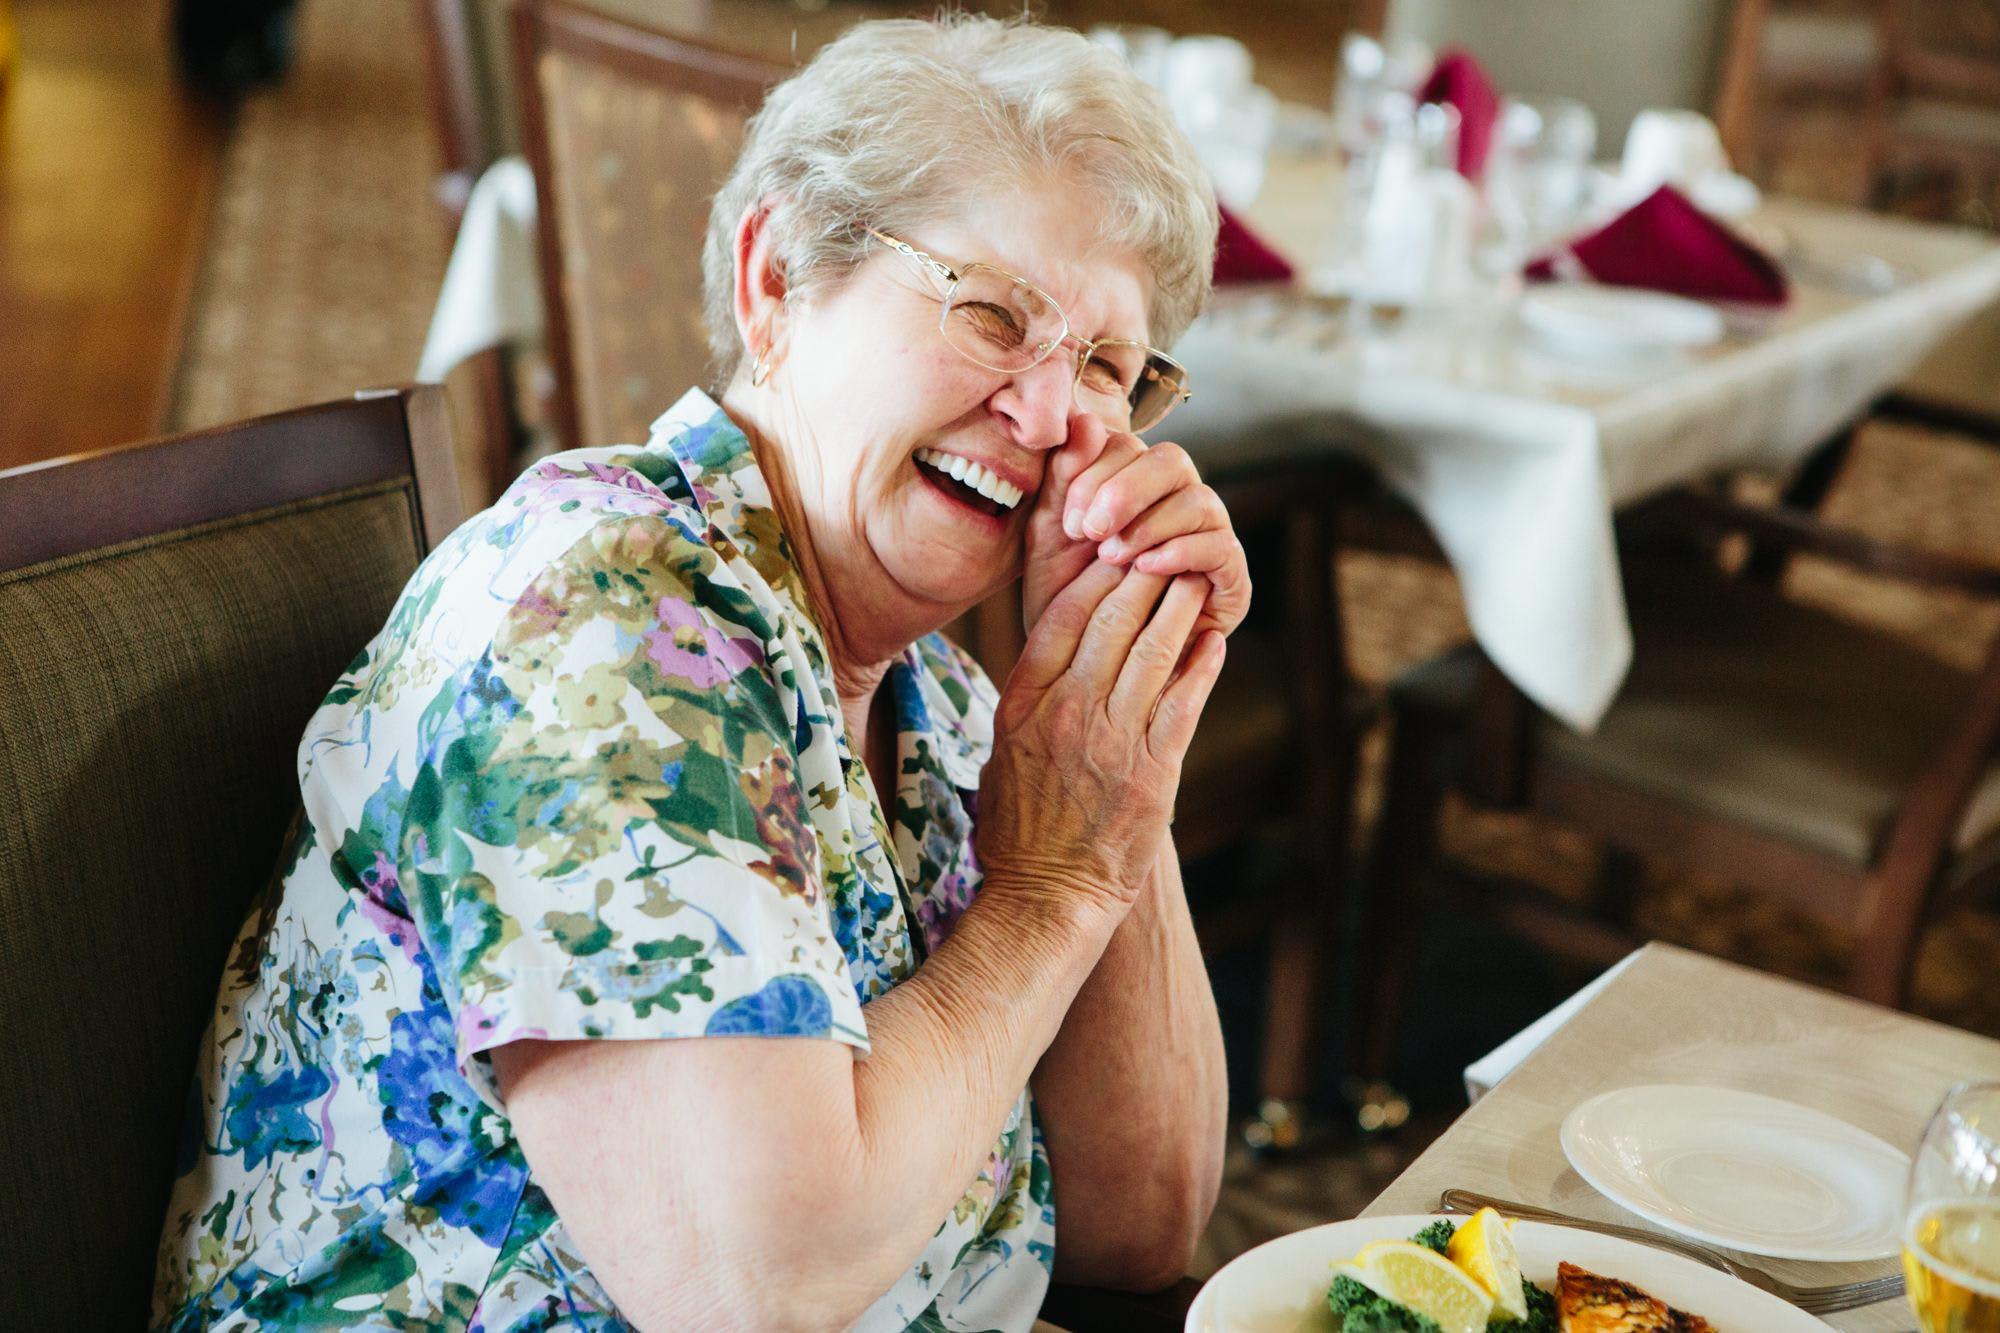 Residents enjoy a meal together in Missoula